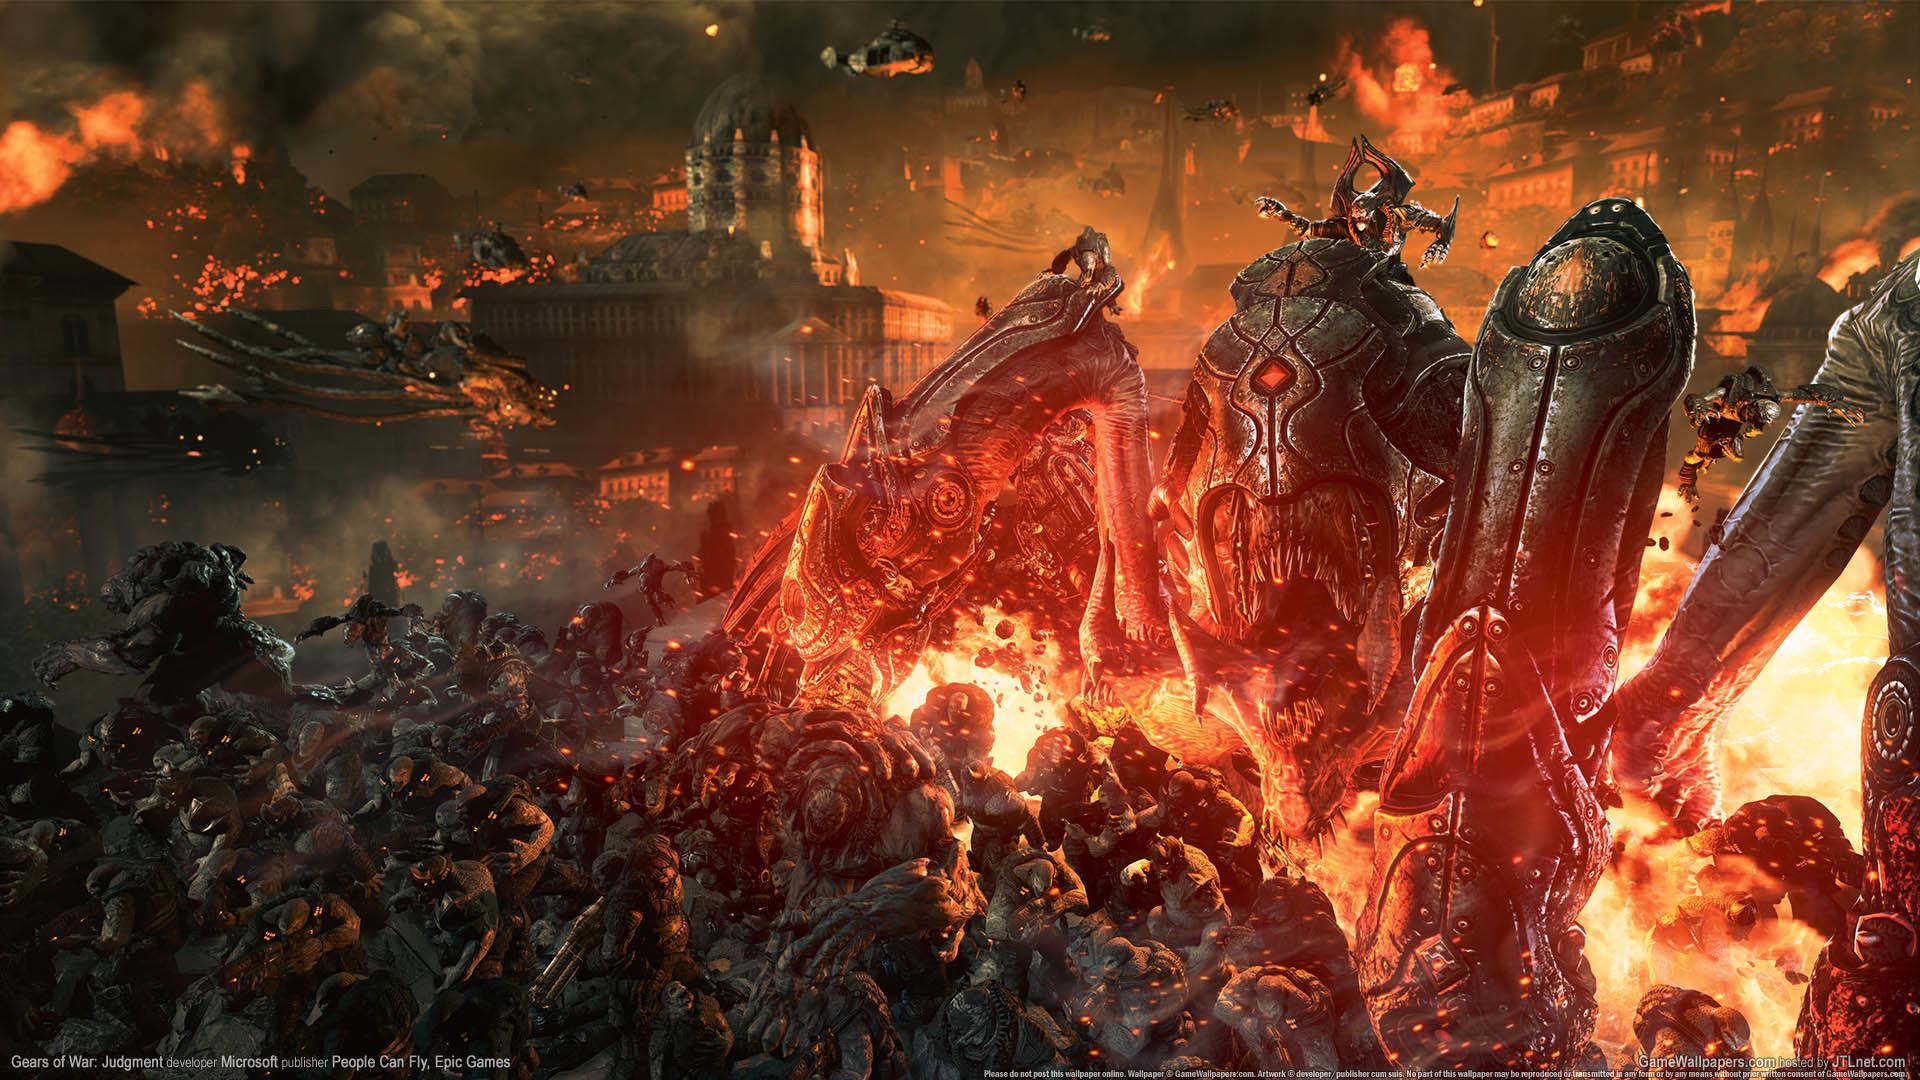 Gears Of War Judgment Wallpaper 76 Images